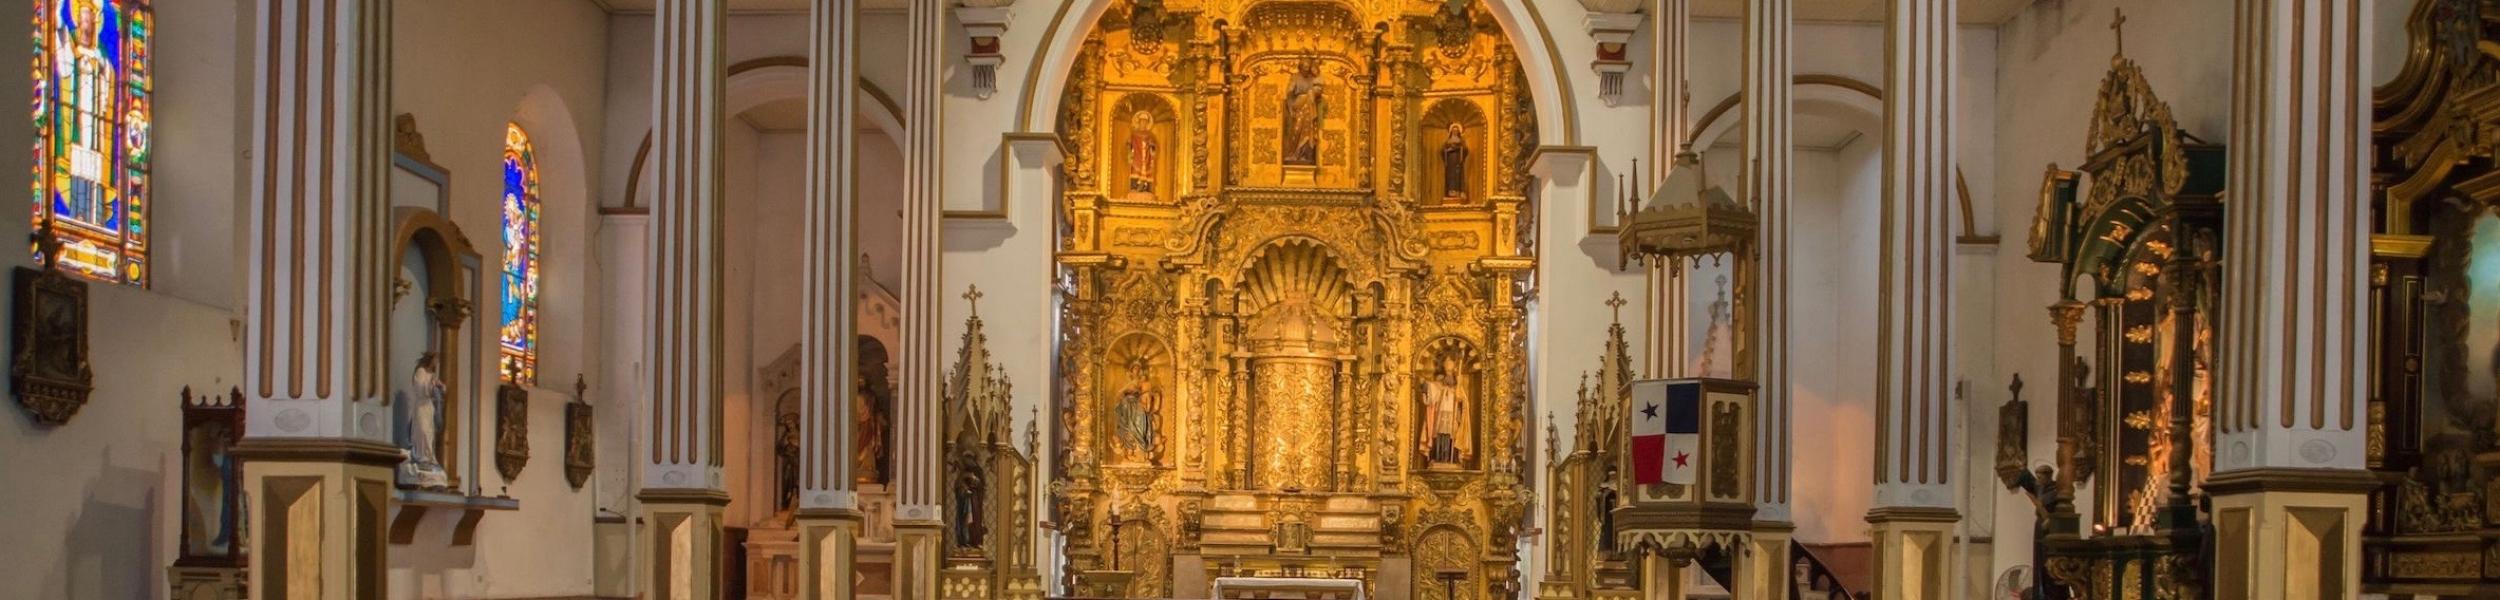 arco-chato-iglesia-church-casco-viejo-panama